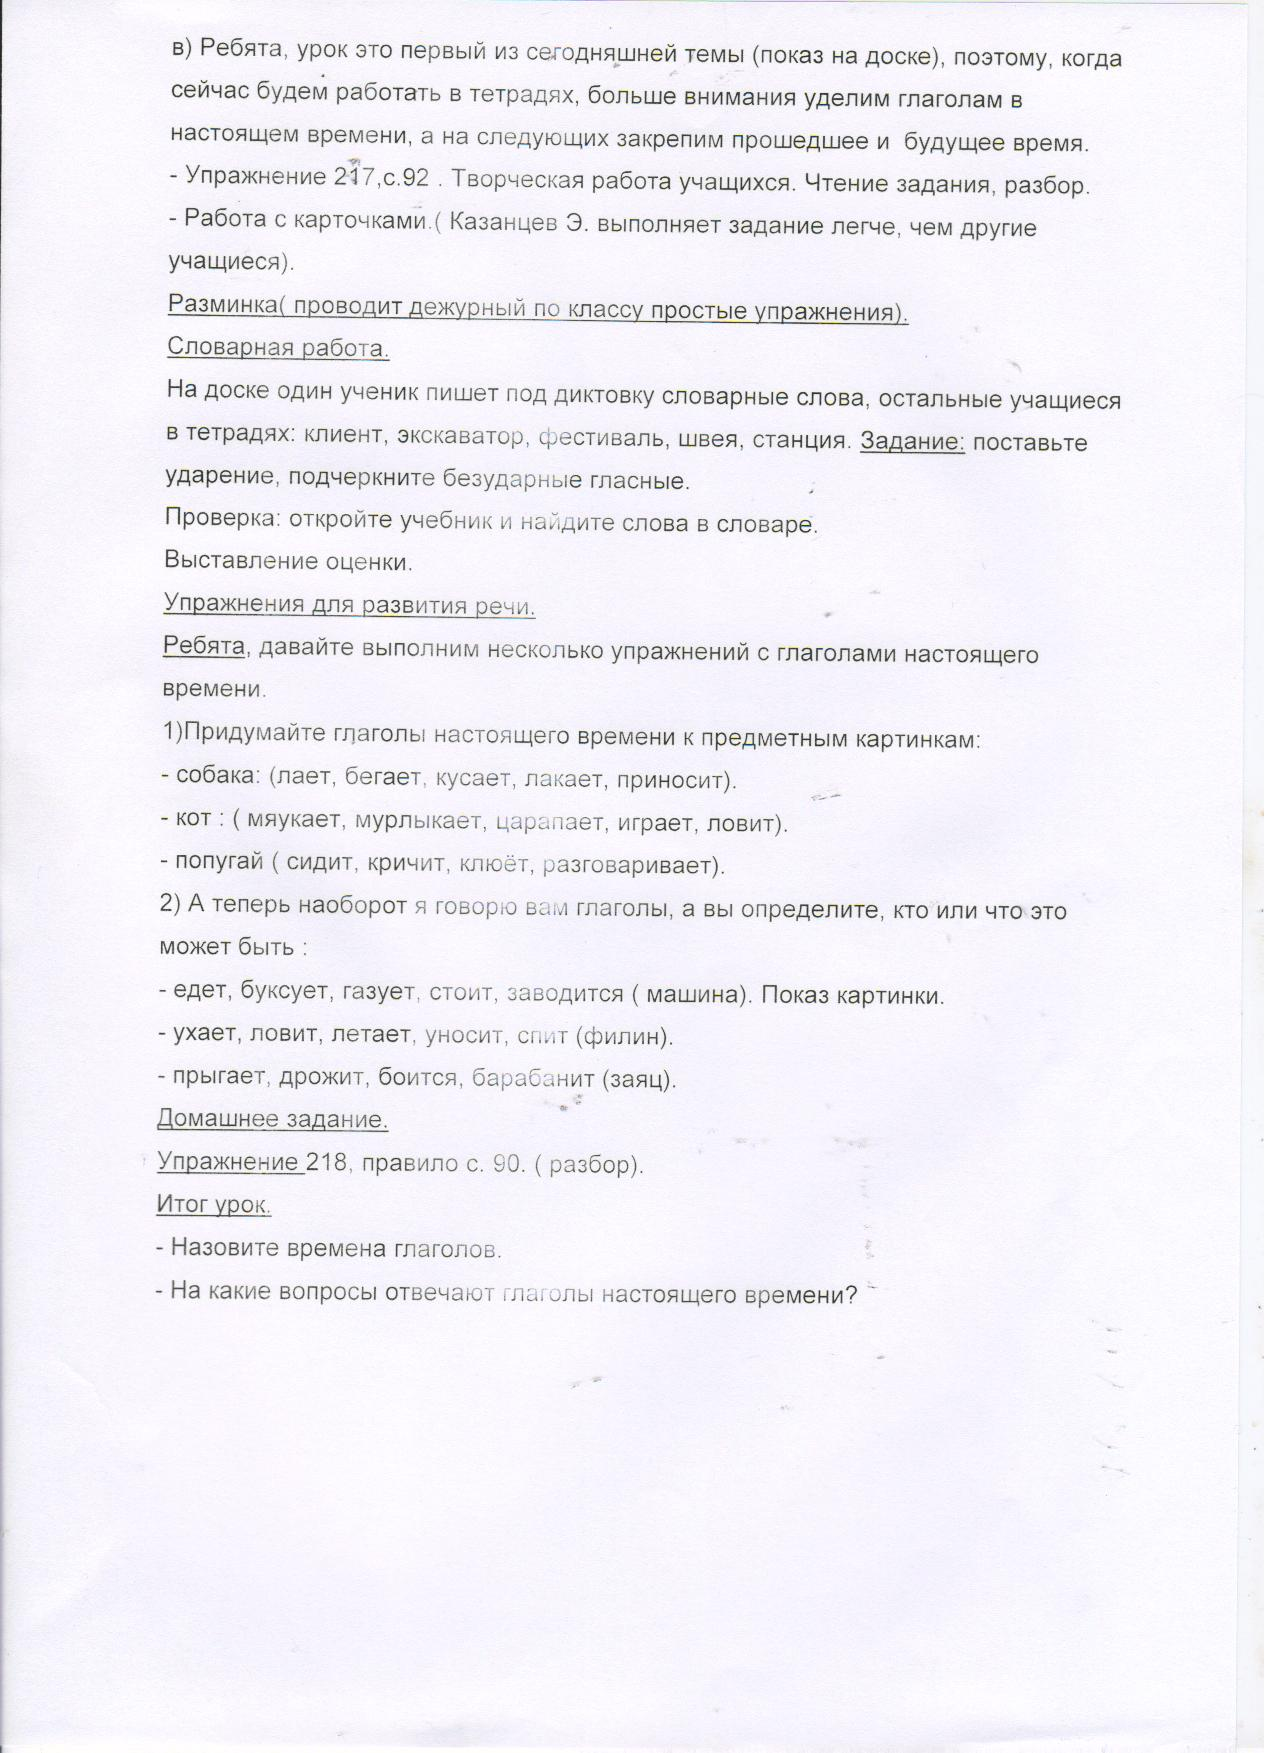 C:\Documents and Settings\Администратор\Рабочий стол\Тептякова Е.А. 015.jpg